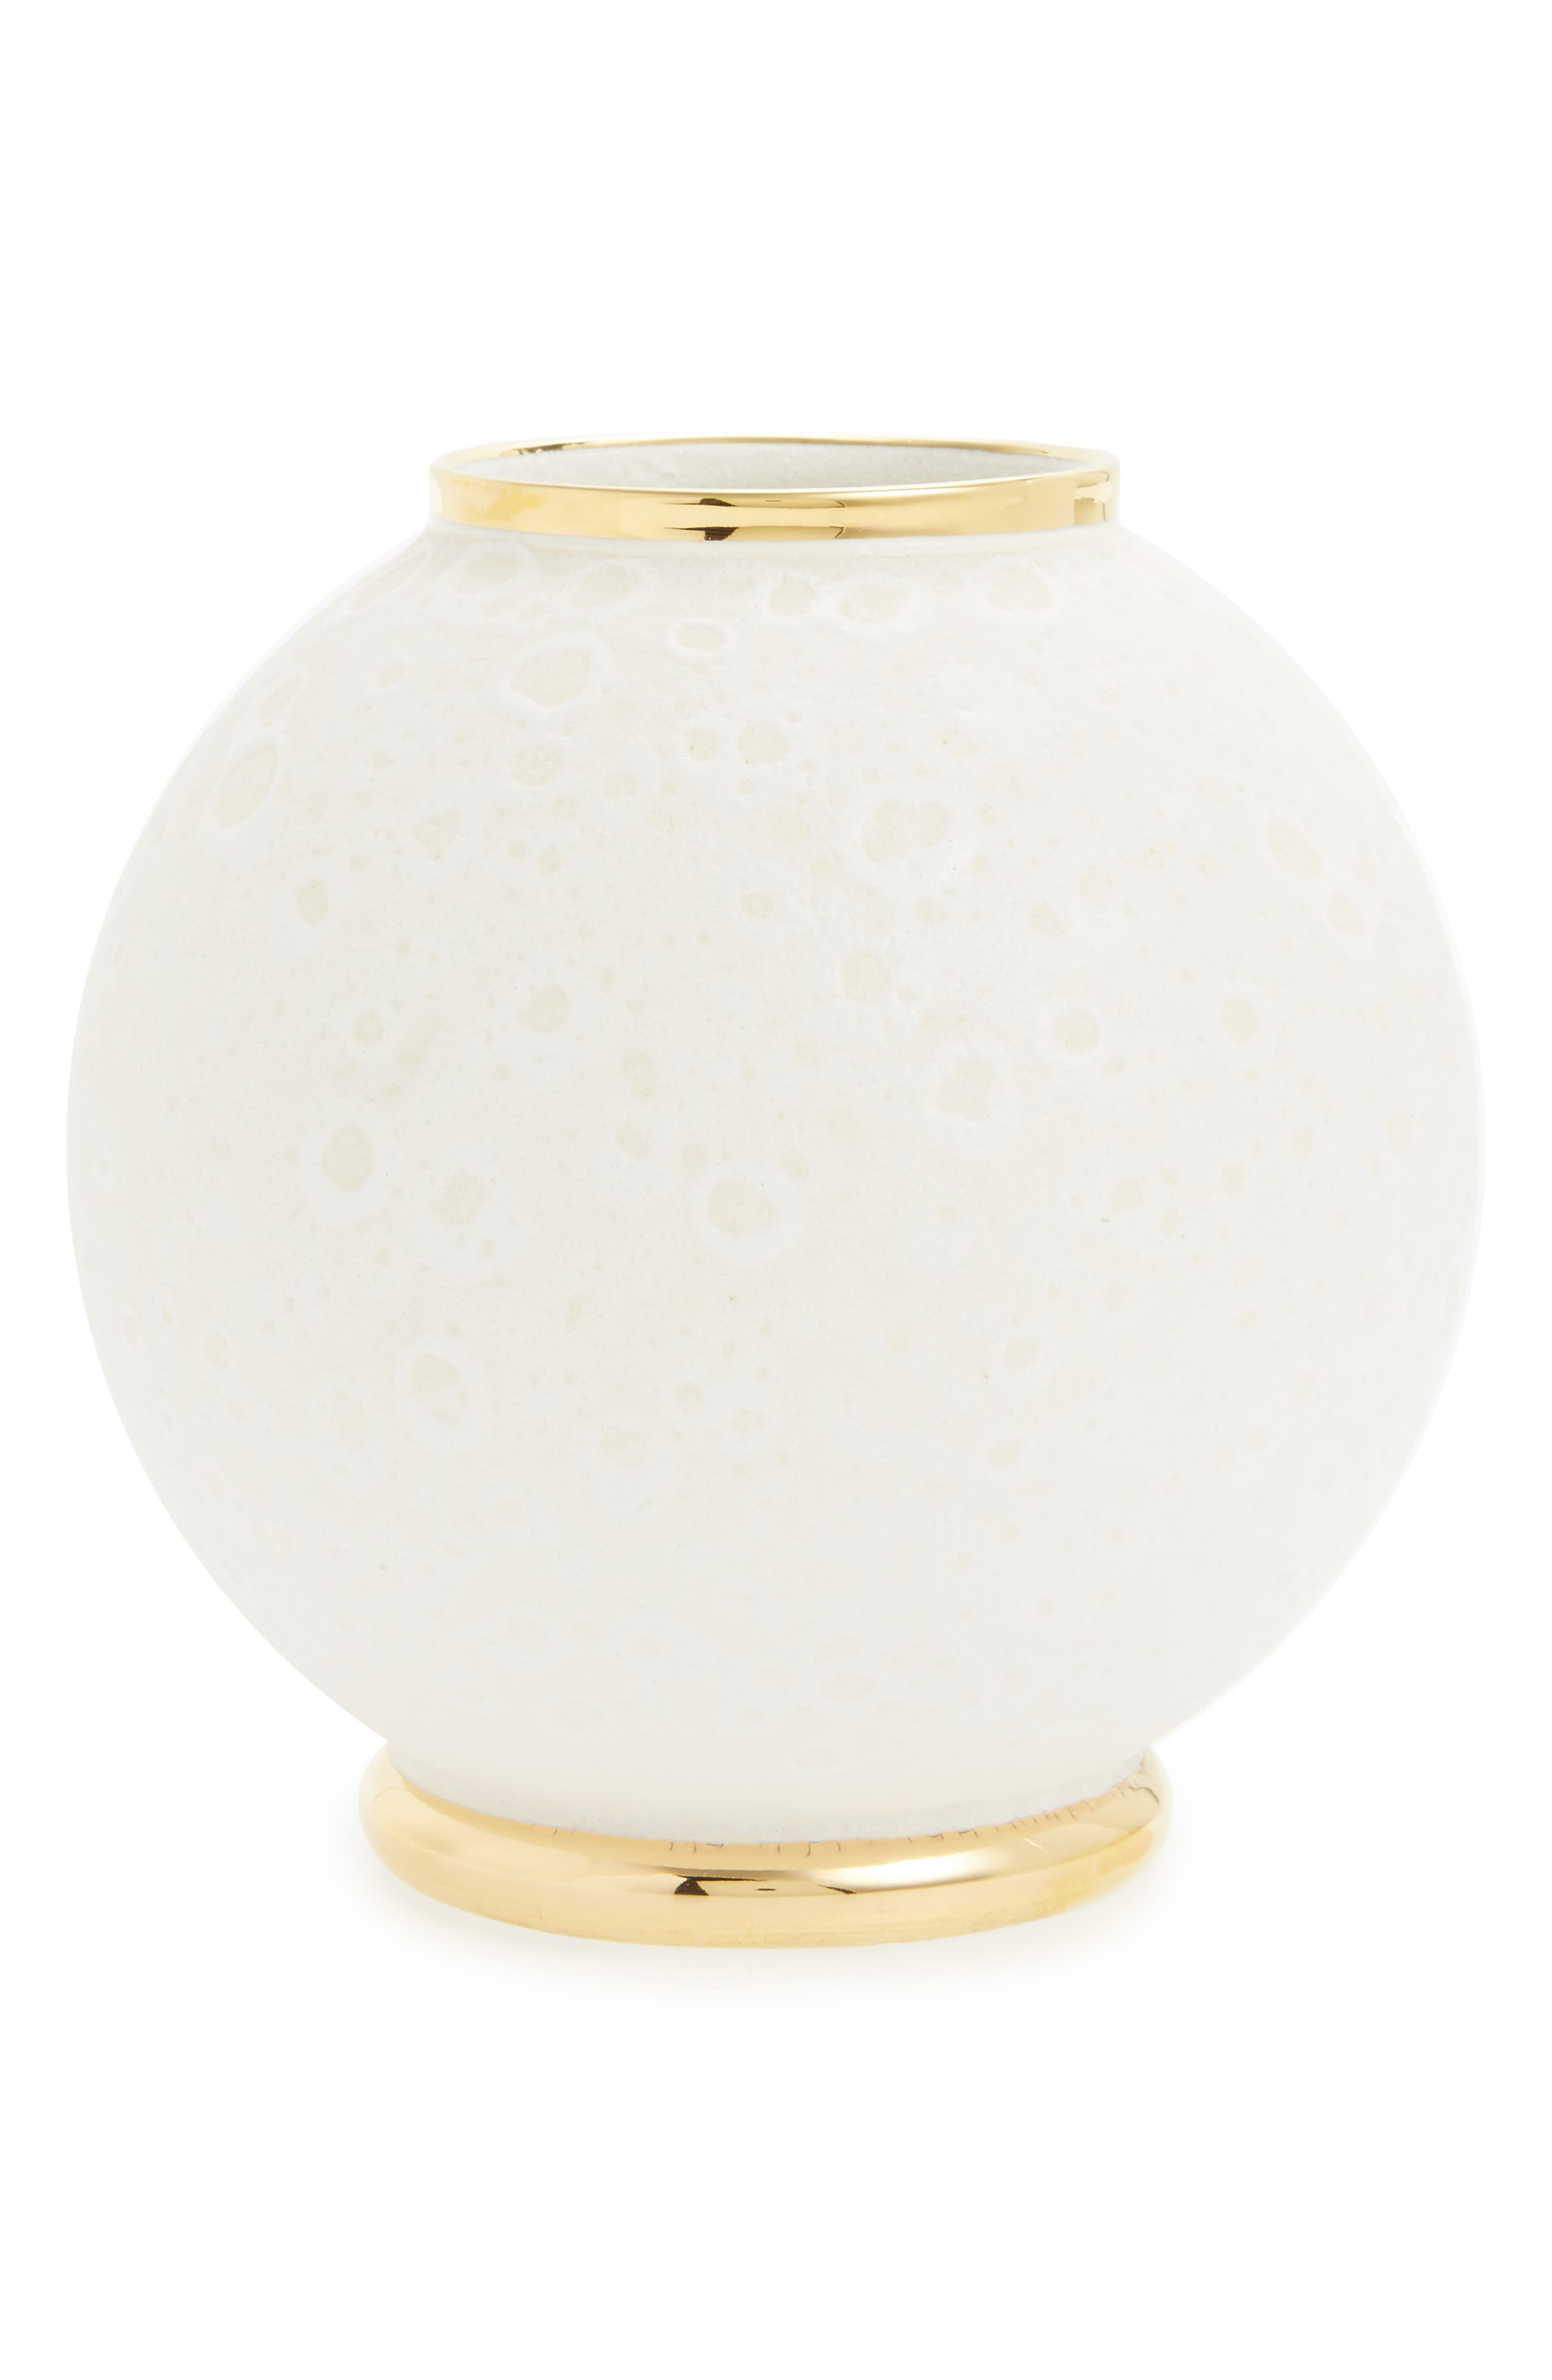 Alternate Image 1 Selected - AERIN Marion Round Ceramic Vase